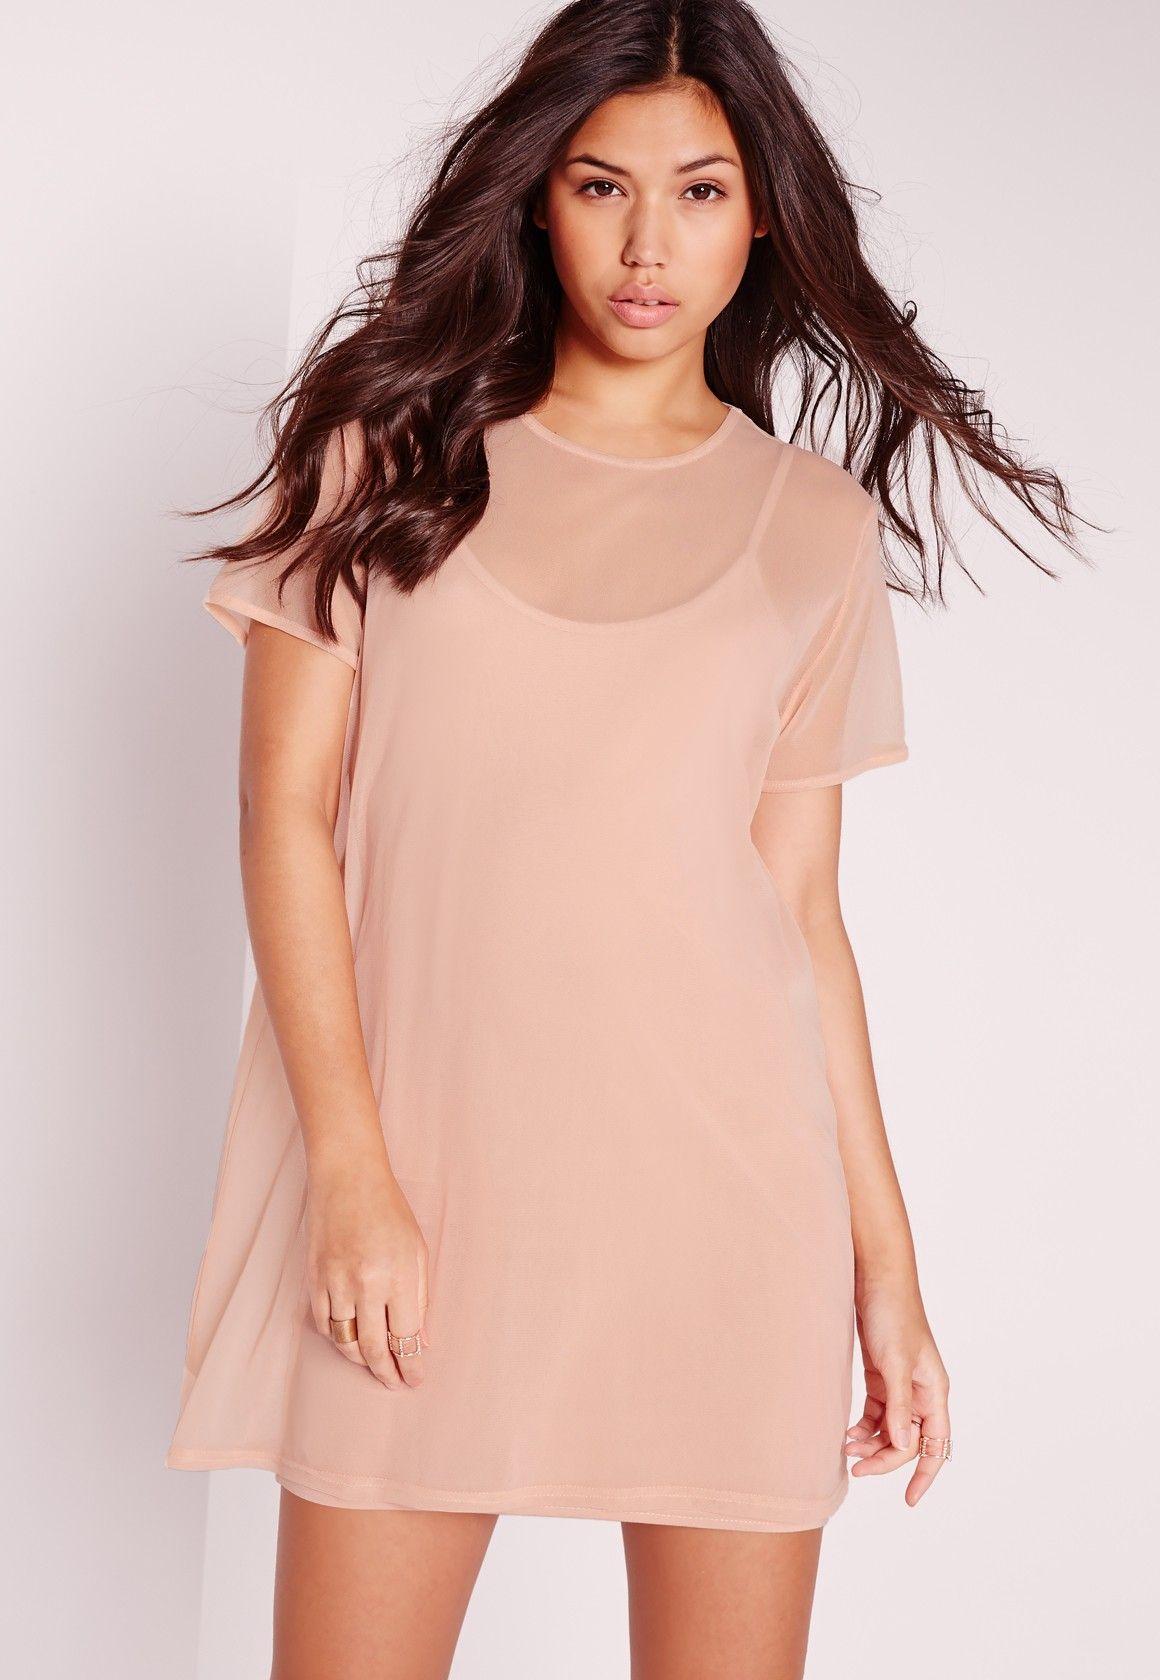 cd47bcd98b6 Missguided - Short Sleeve Mesh T-Shirt Dress Nude  42